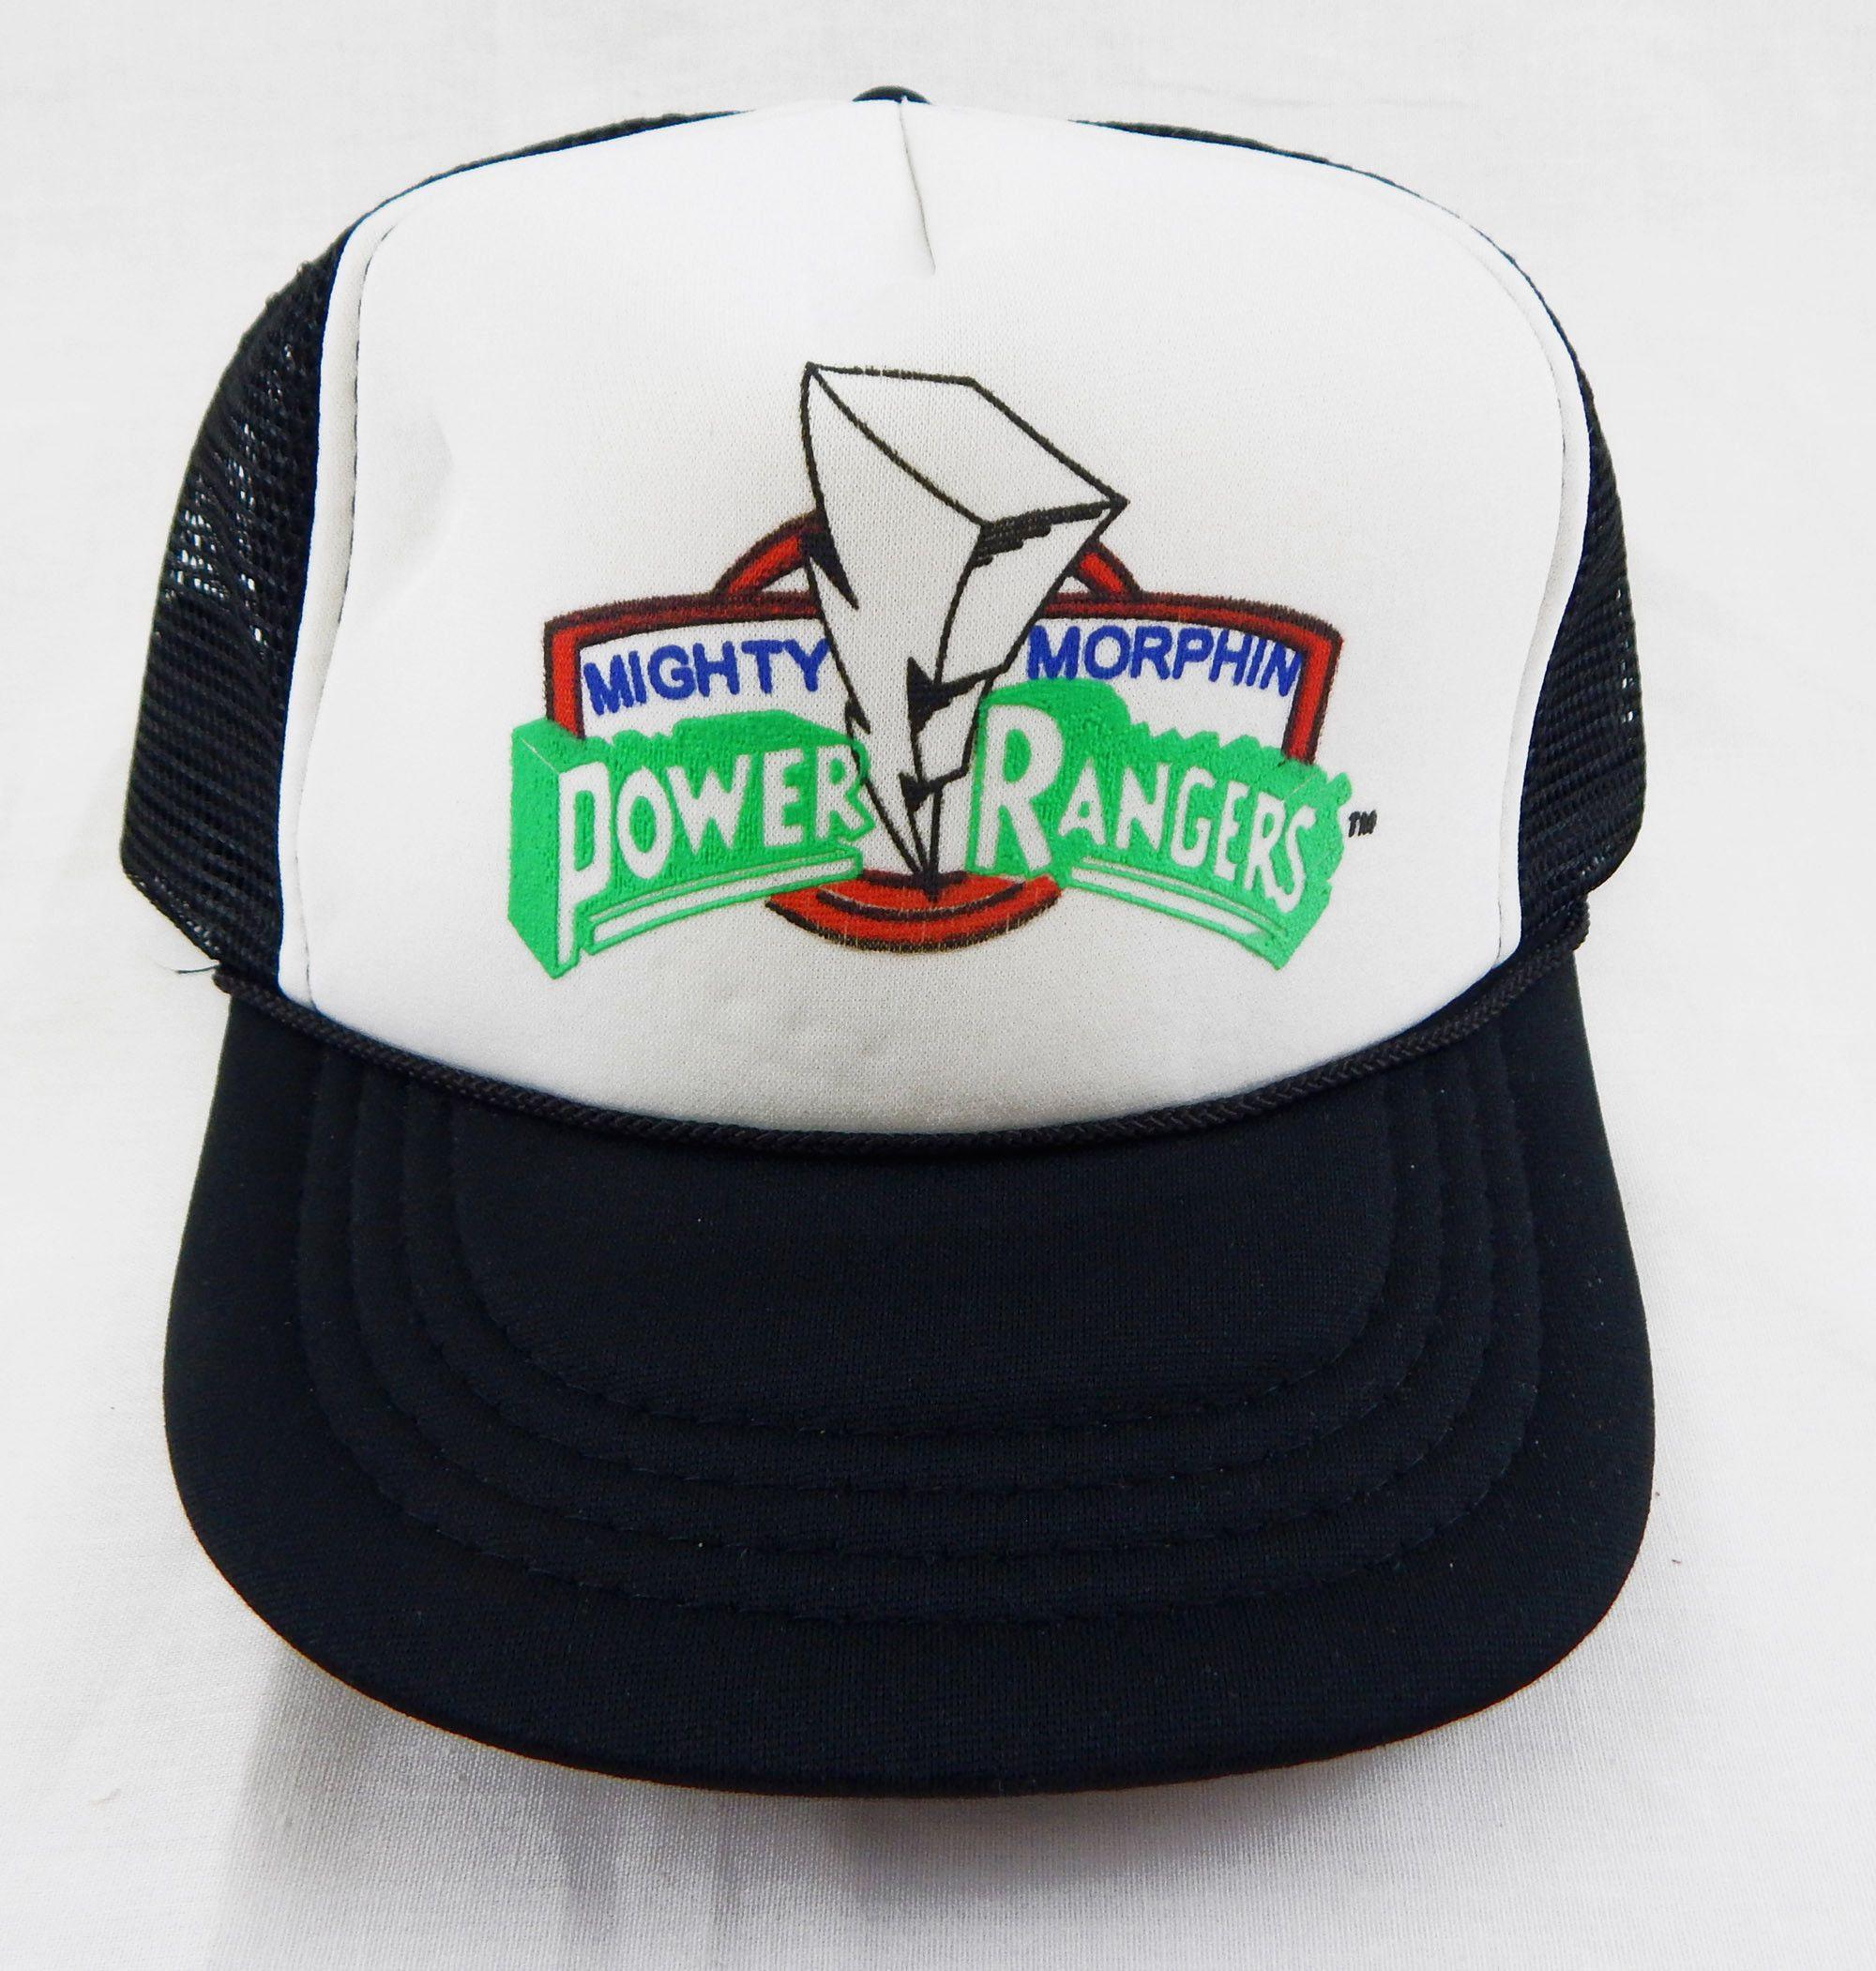 8b4a9eb67e4 Vintage 1990 s Mighty Morphin Power Rangers Black Mesh Youth Trucker Hat